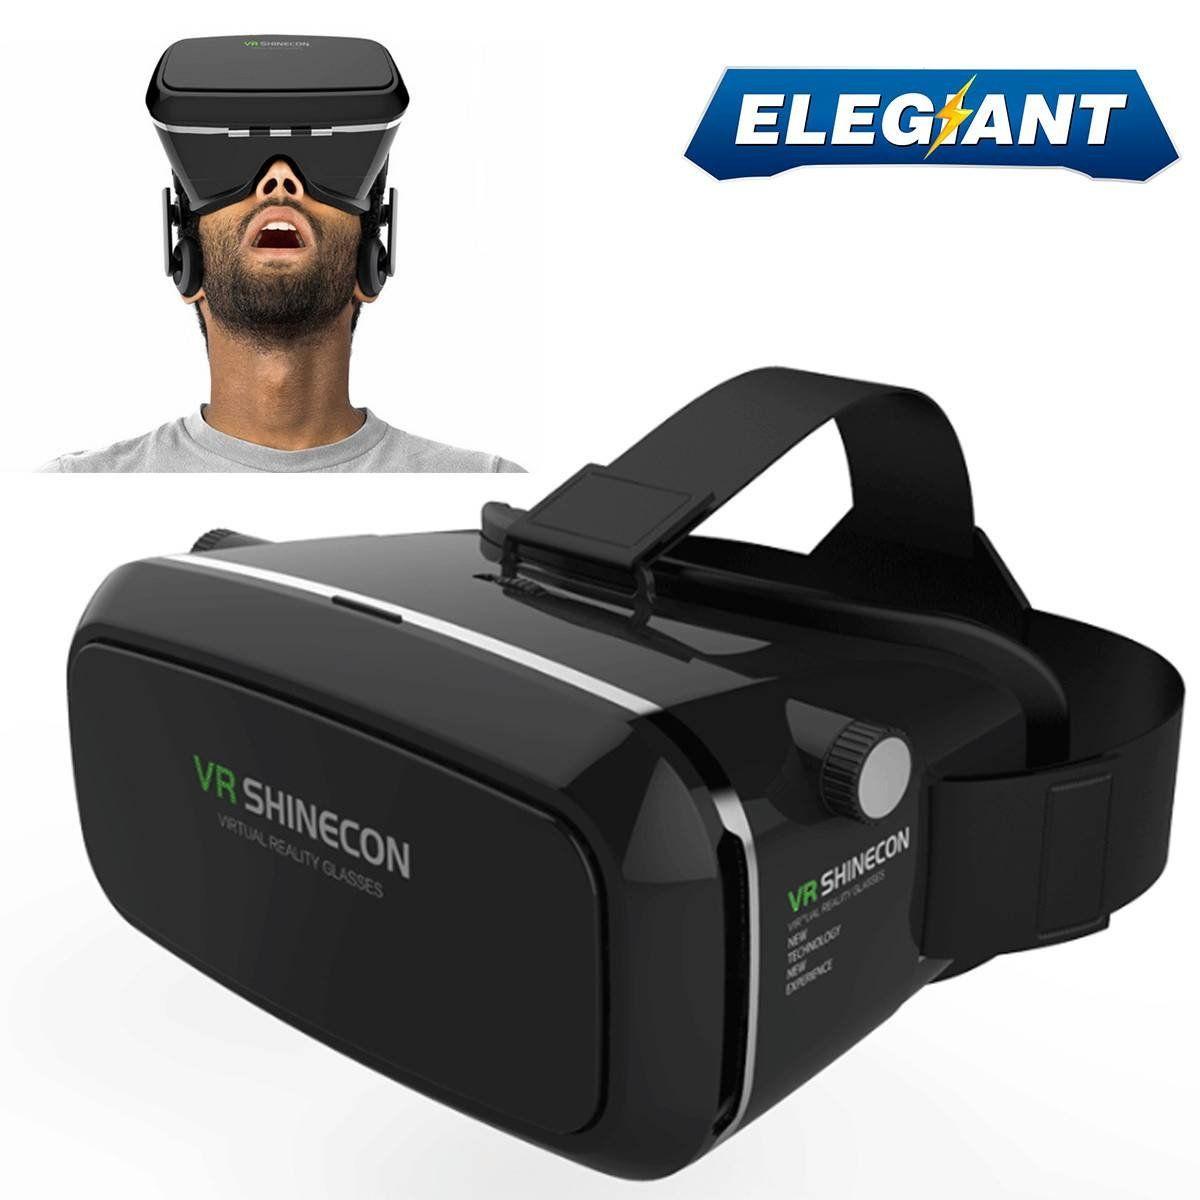 Elegiant 360 Viewing Immersive Virtual Reality 3d Vr Glasses